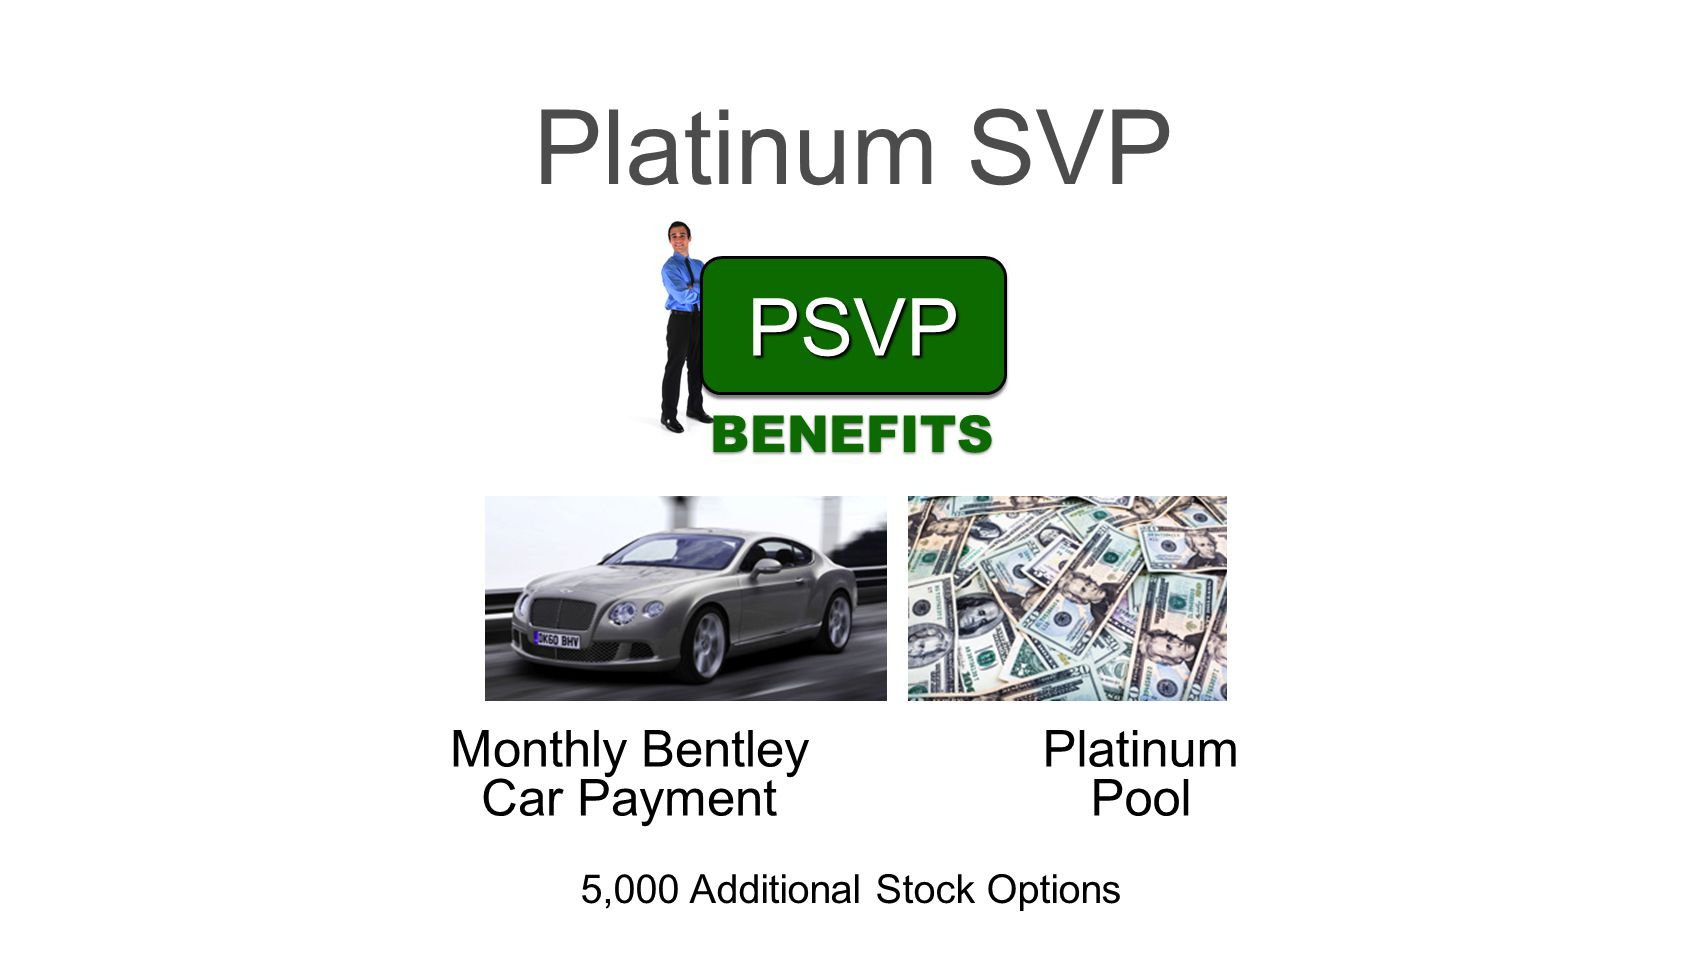 Platinum SVP PSVP BENEFITS Monthly Bentley Car Payment Platinum Pool